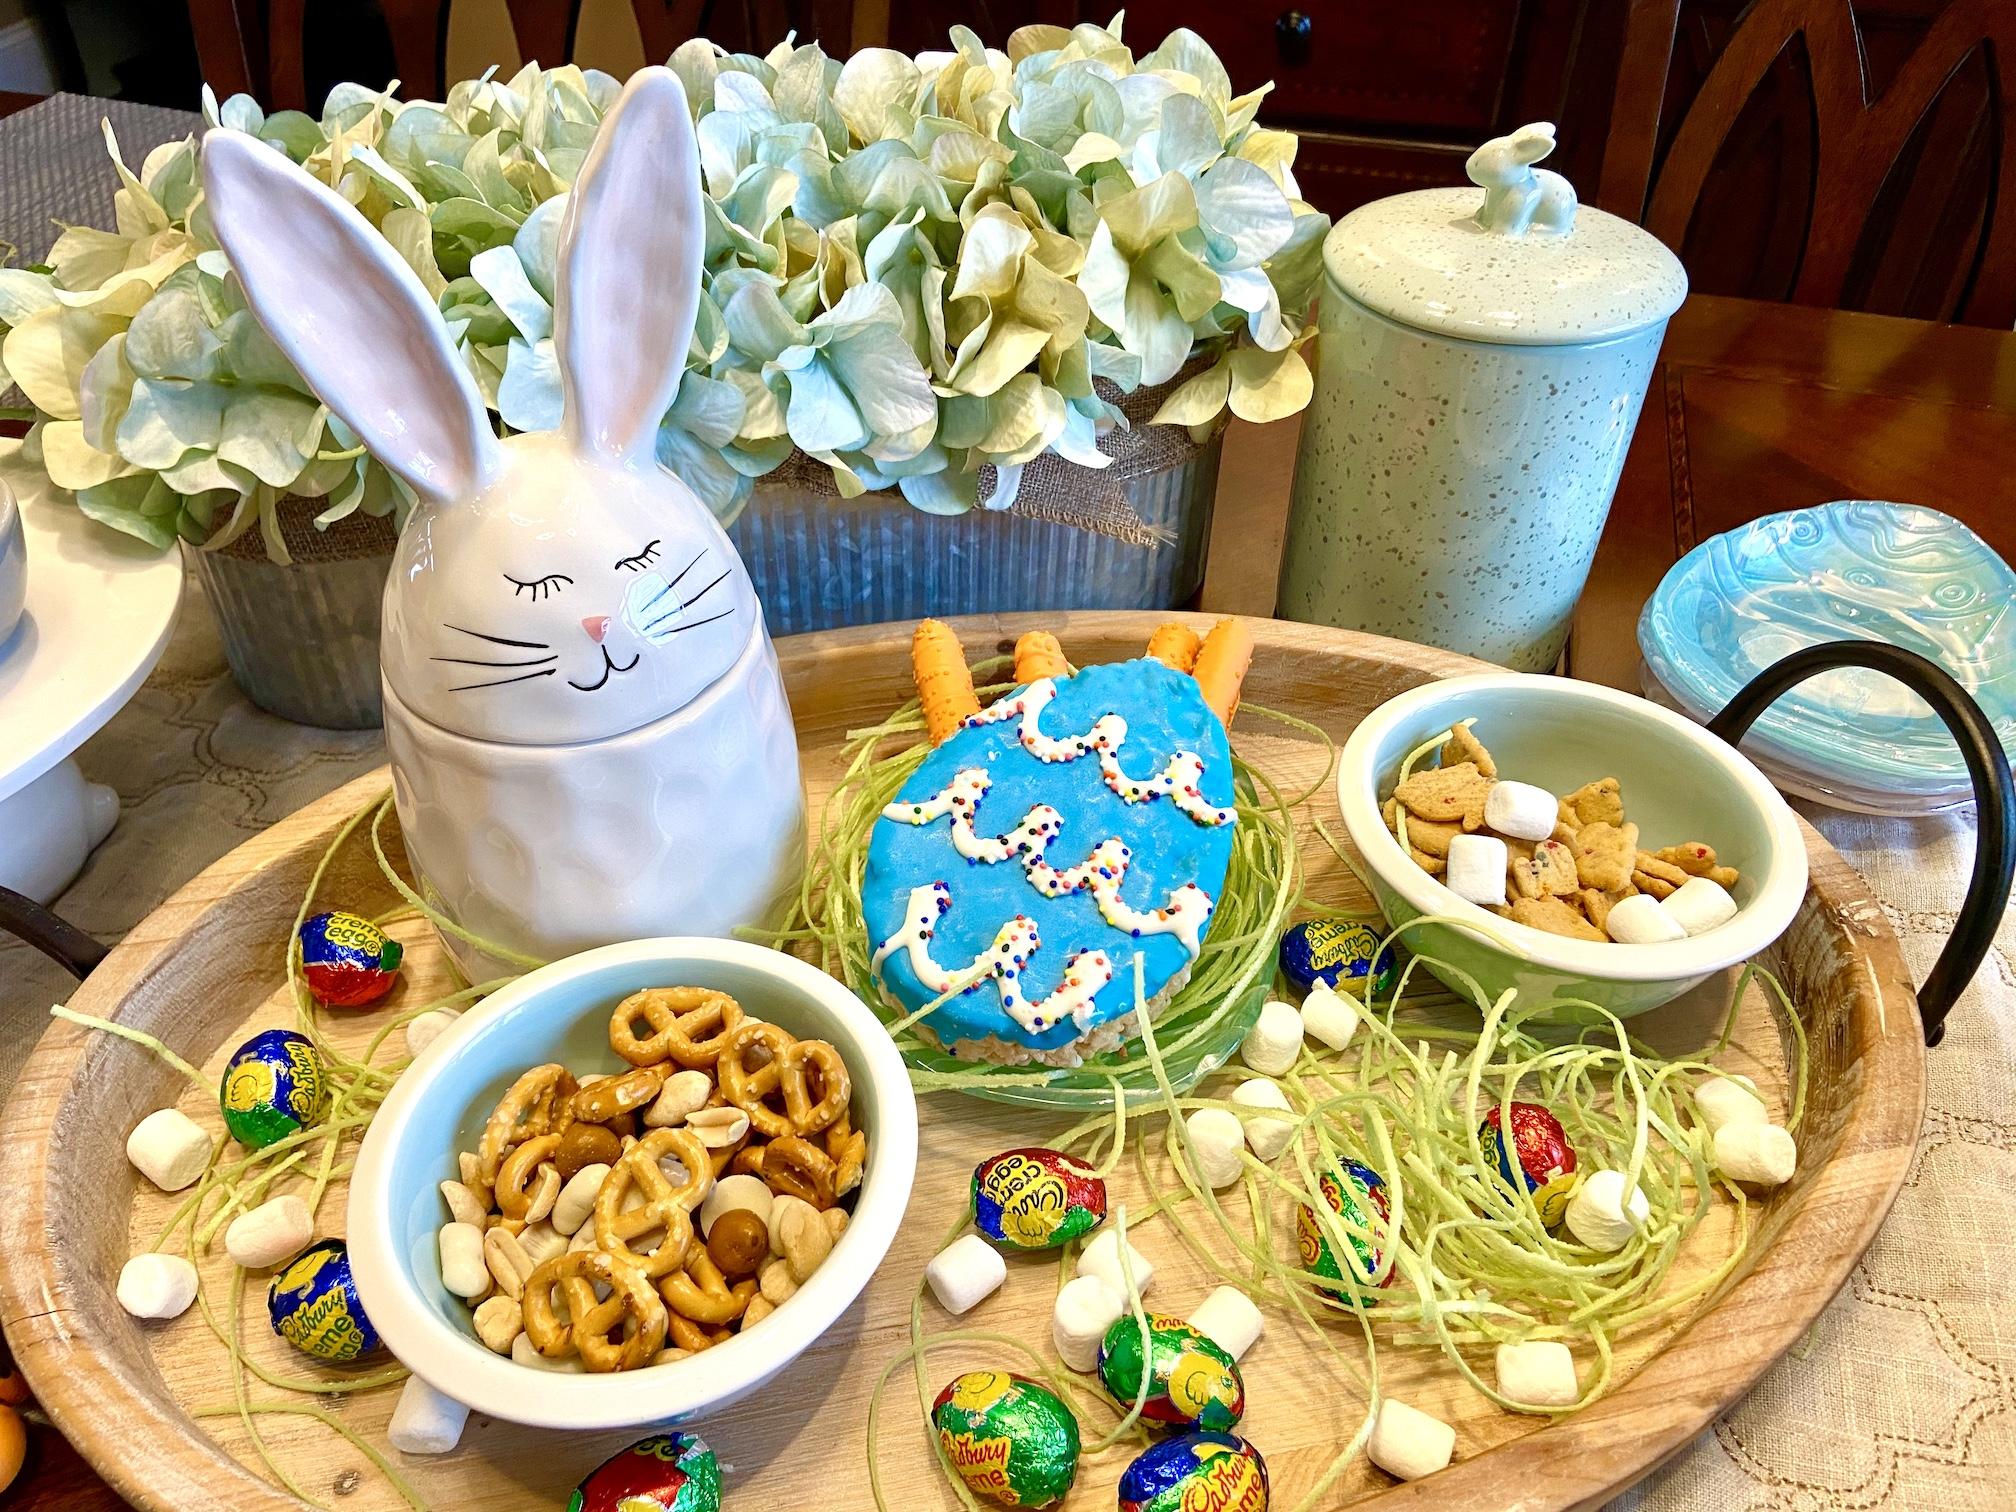 Bunny Dessert Themed Tray